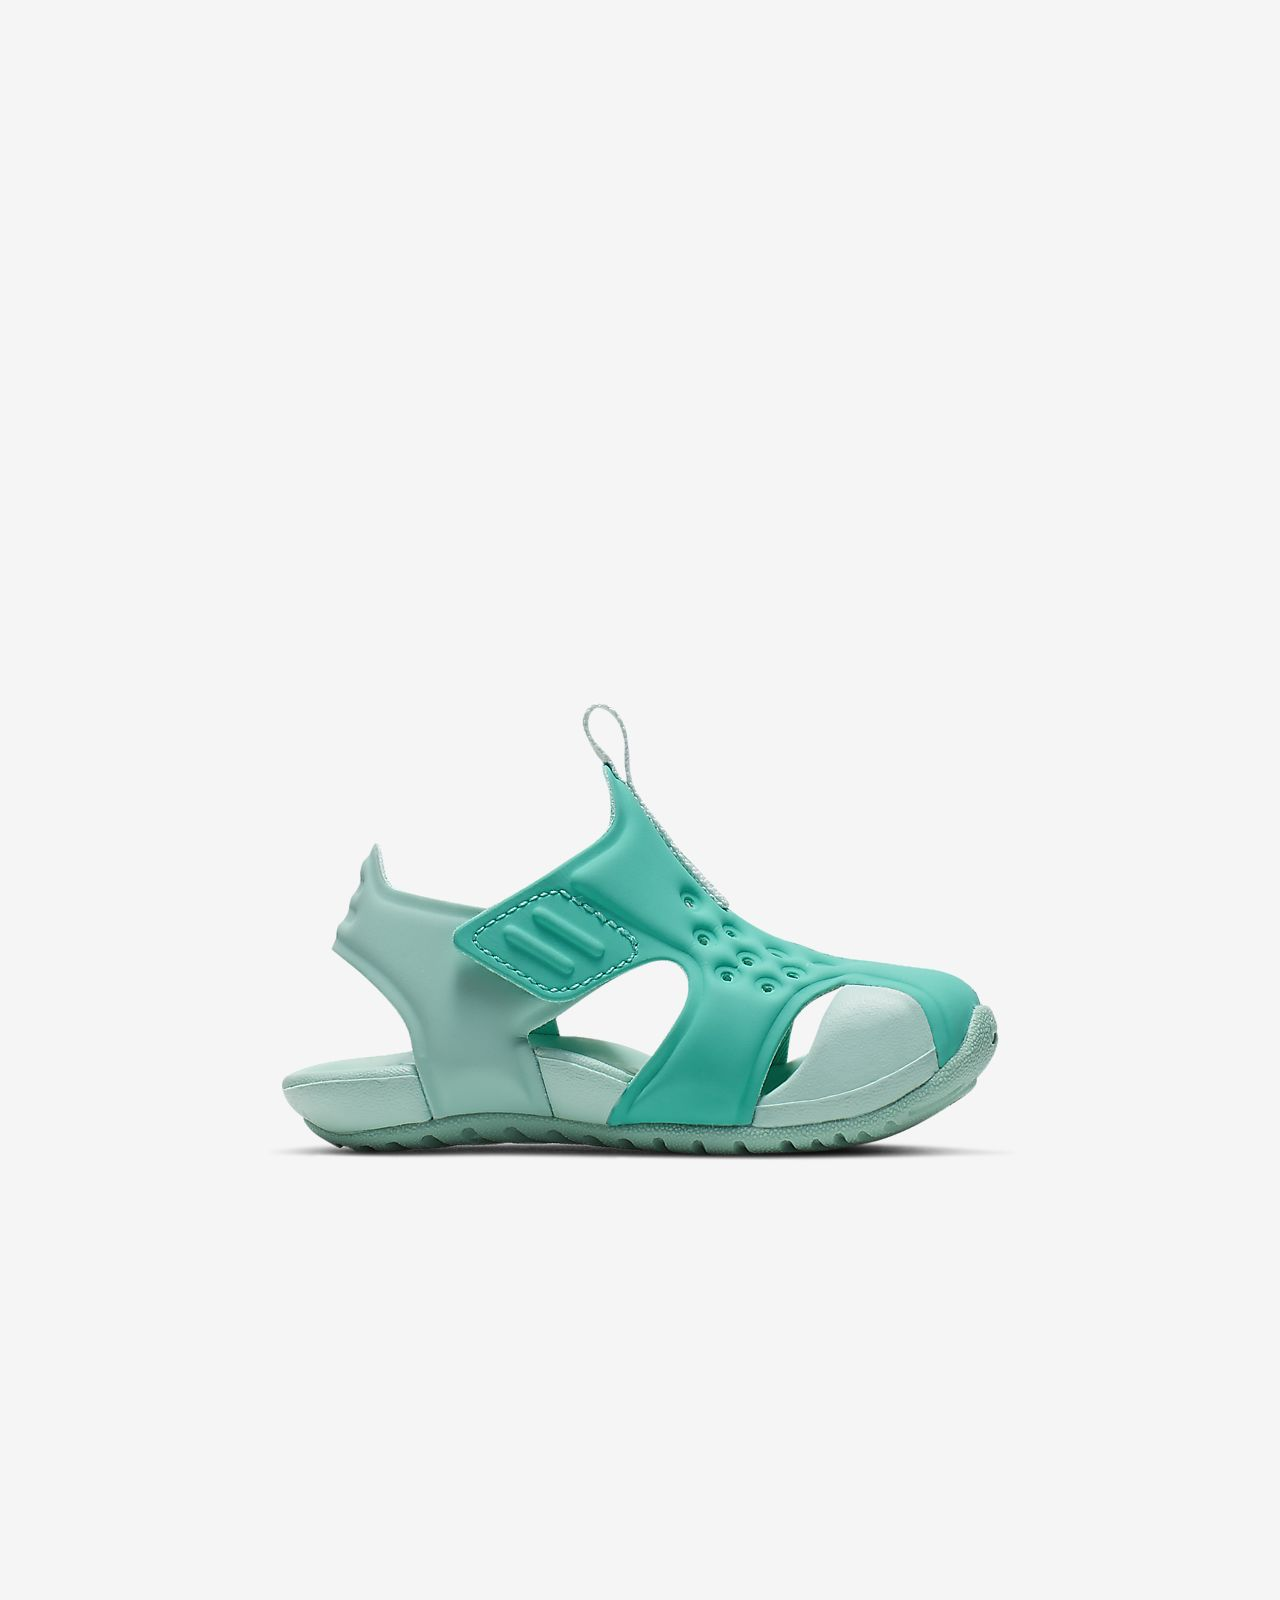 a7f4f7b81897b Sandale Nike Sunray Protect 2 pour Bébé Petit enfant. Nike.com BE